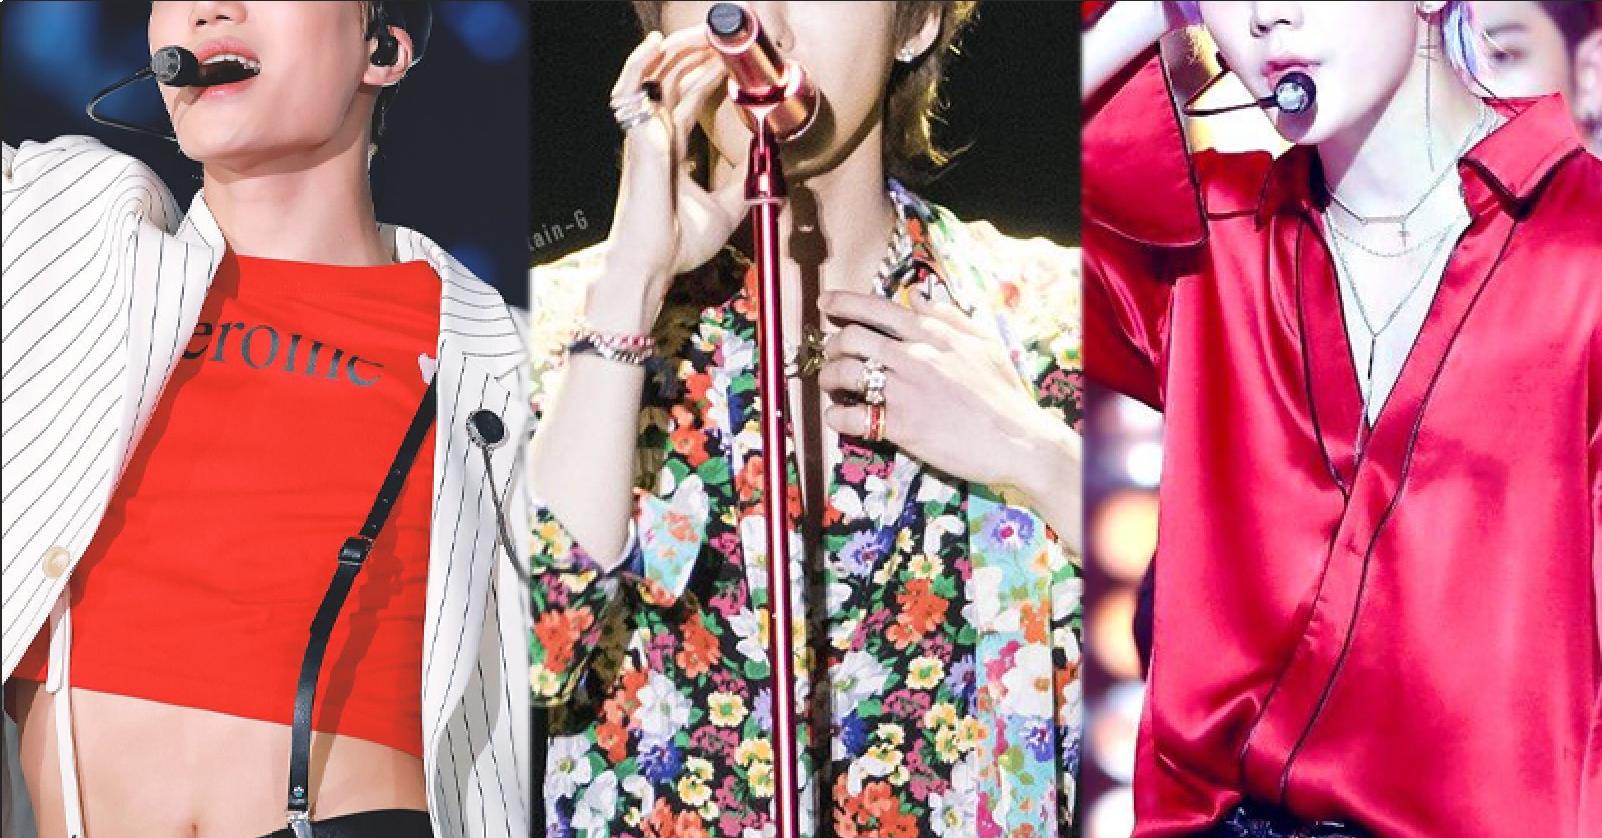 Top 9 K-pop Idols Who Shuts Gender Stereotypes With Genderless Image